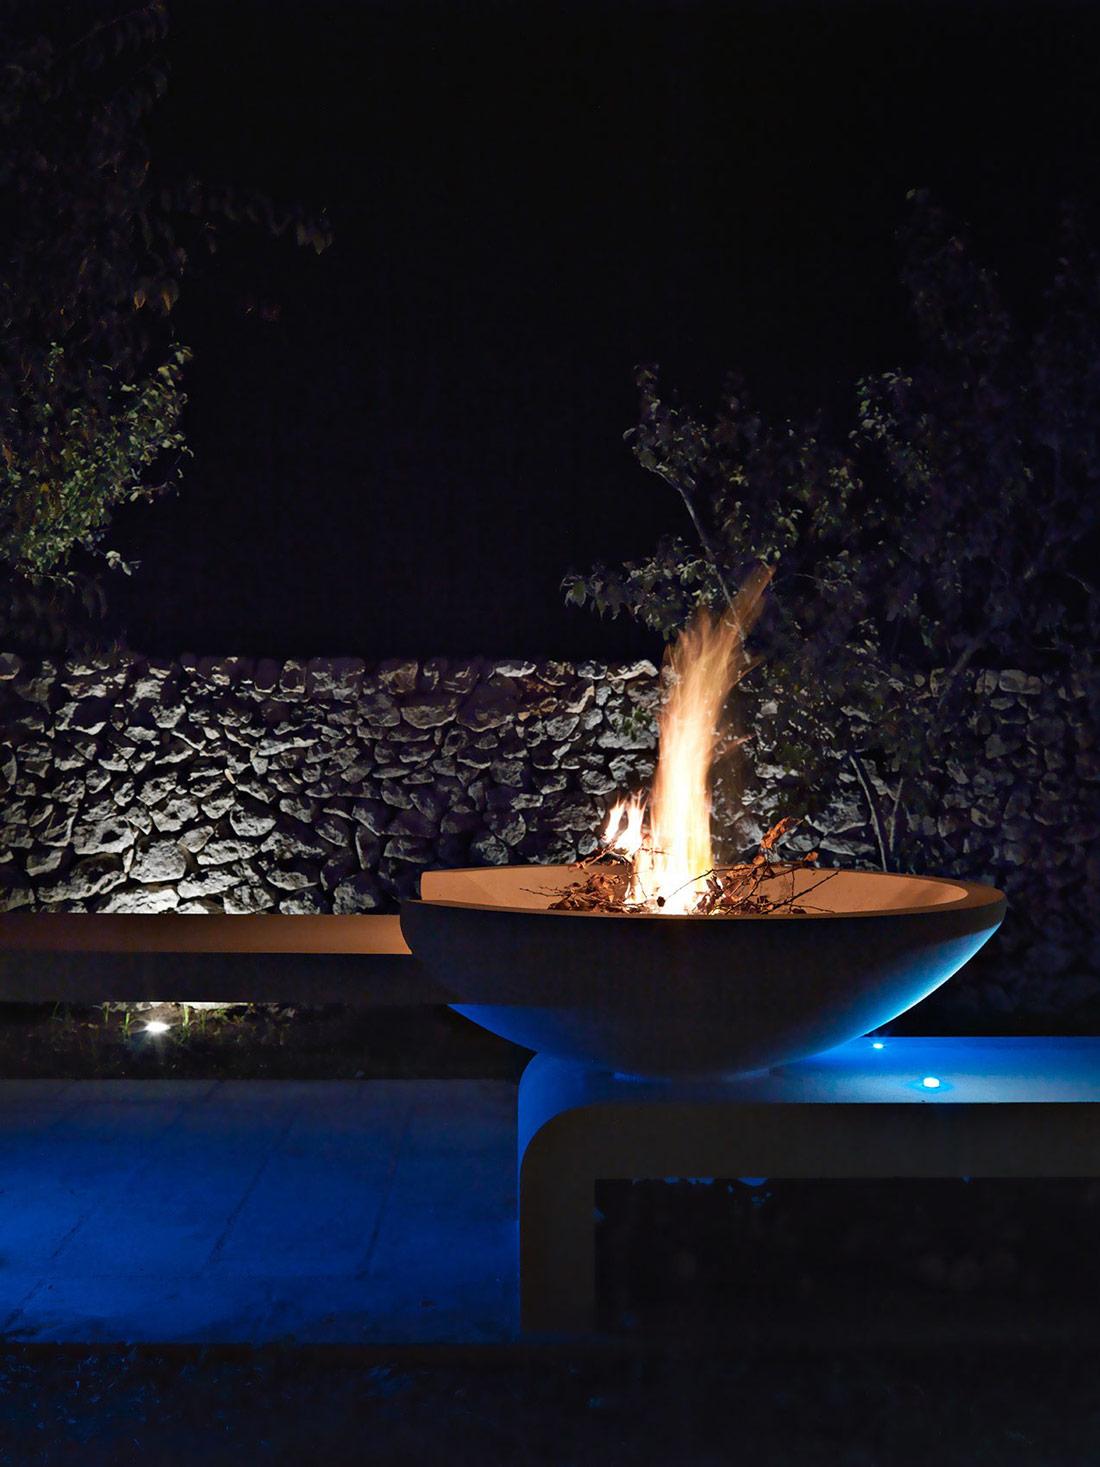 Fire Pit, Blue Lighting, Relais Masseria Capasa Hotel in Martano, Italy